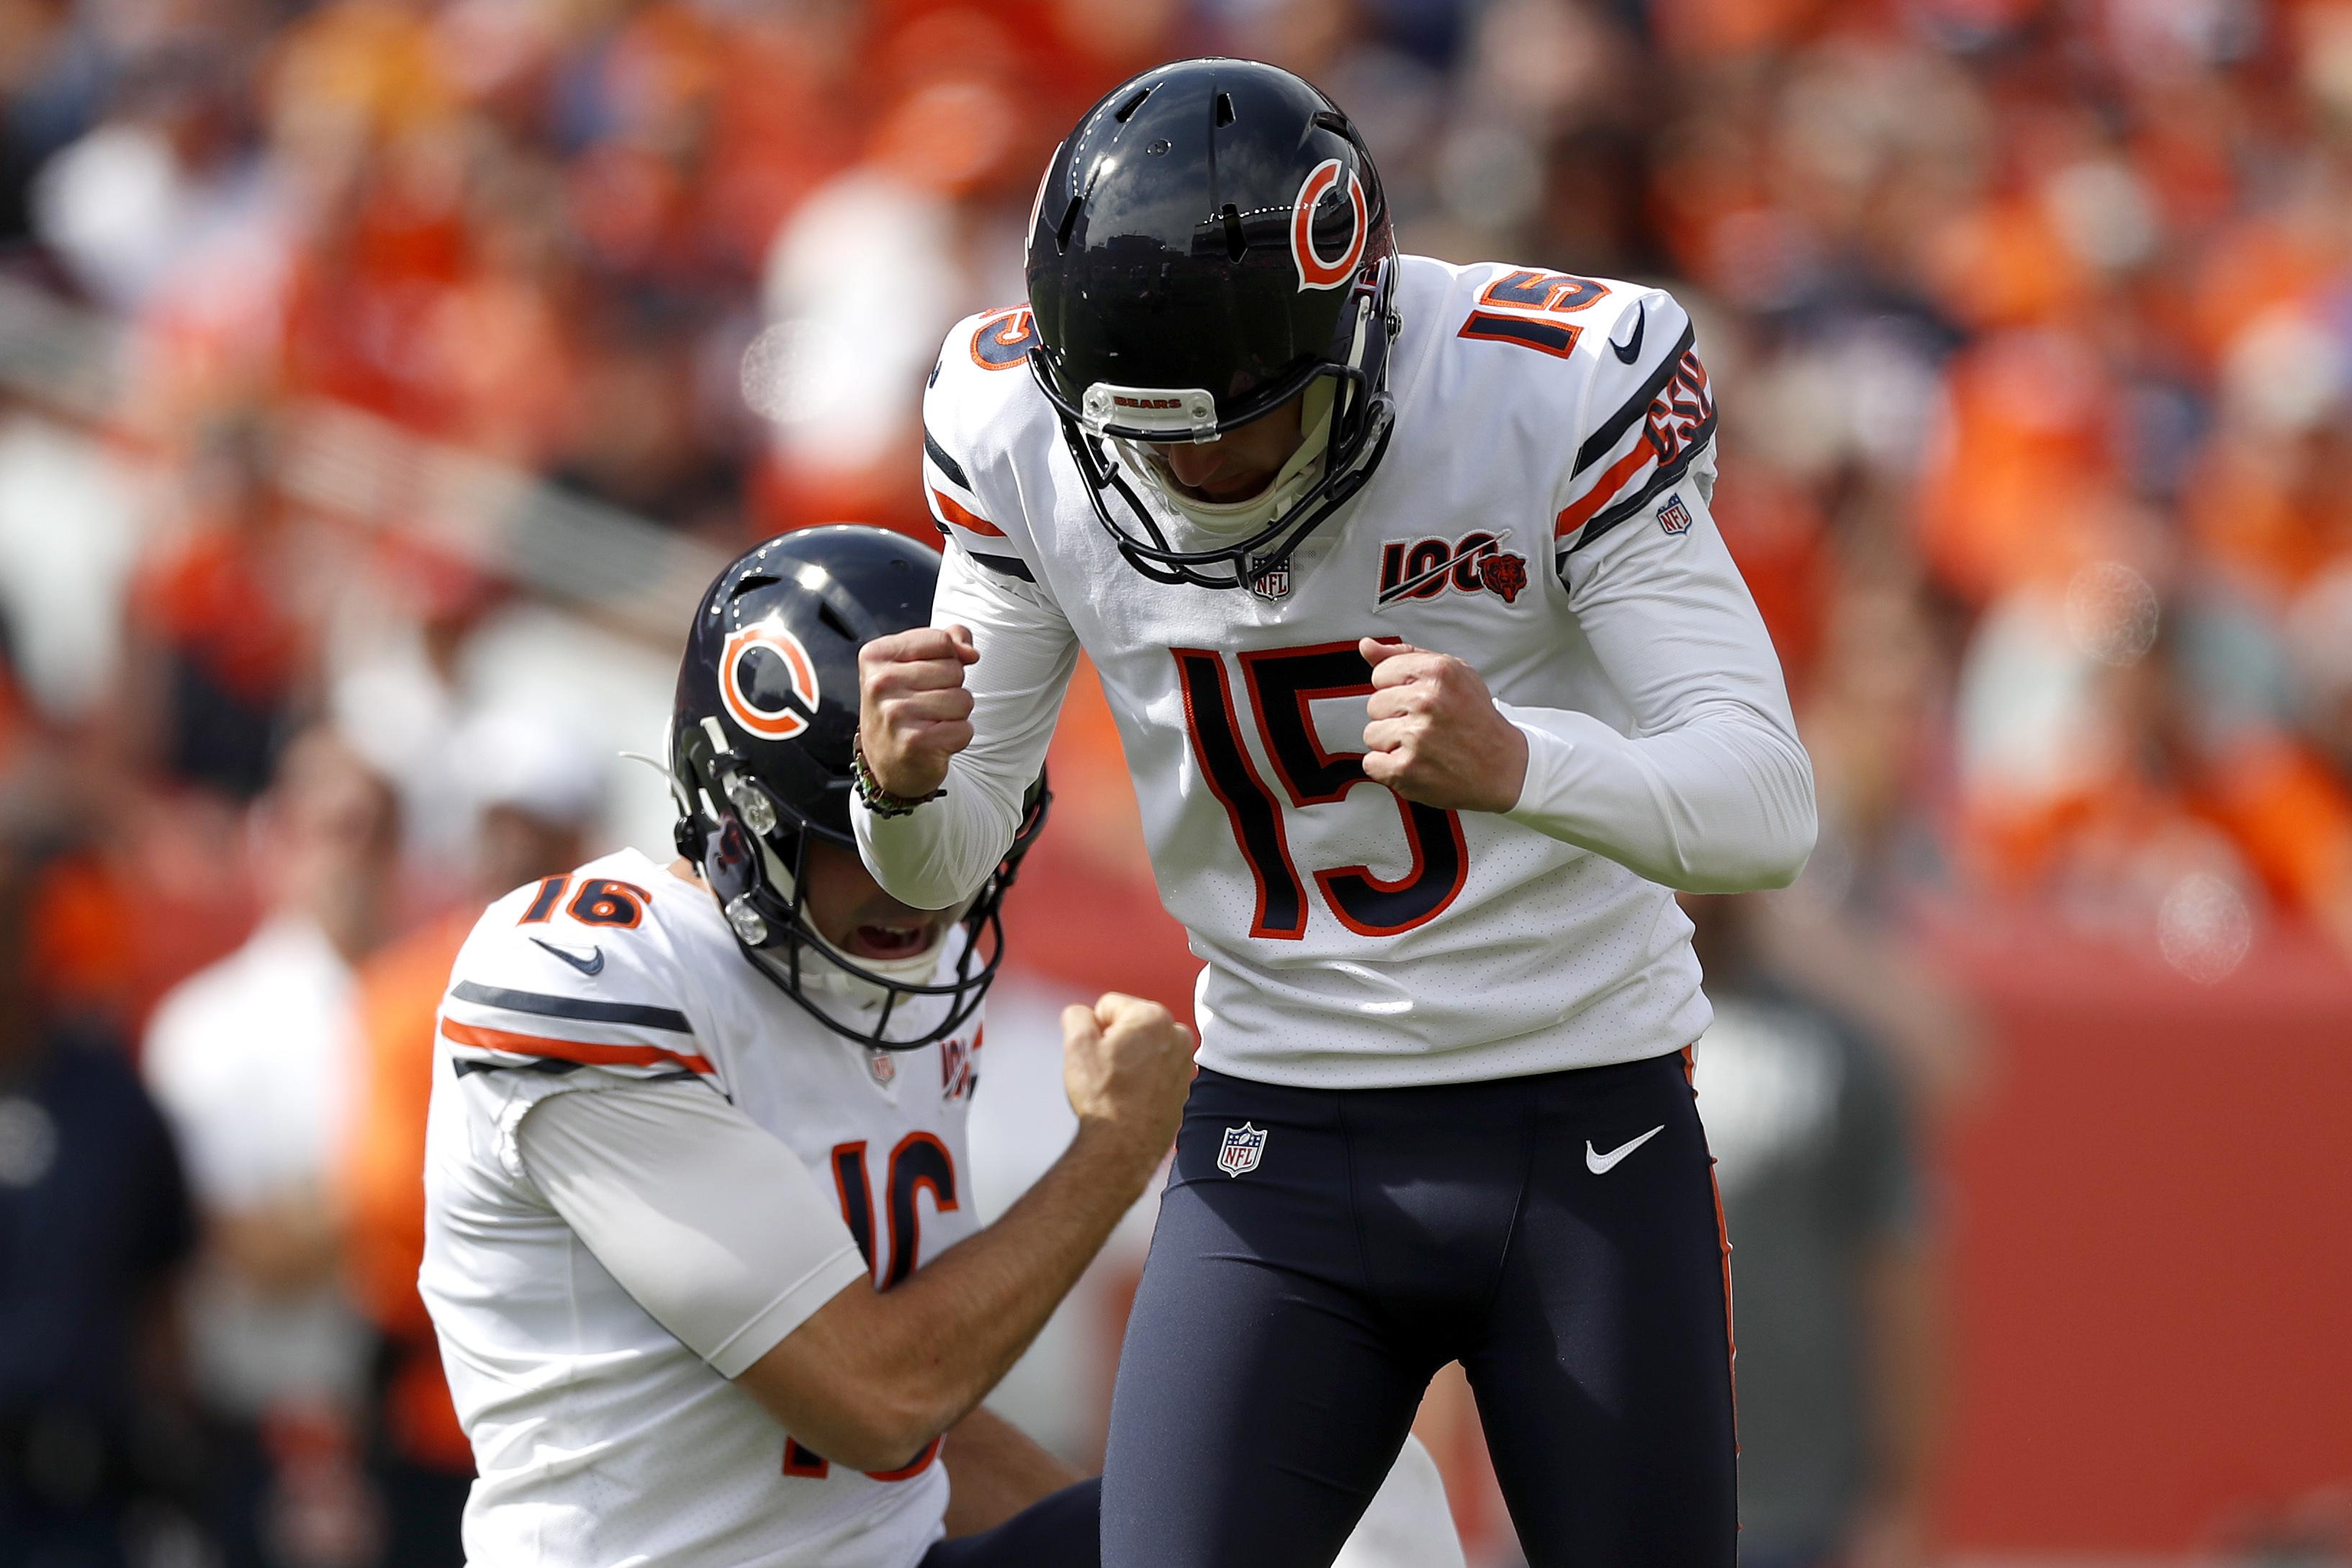 Pineiro's 53-yard field goal lifts Bears past Broncos 16-14